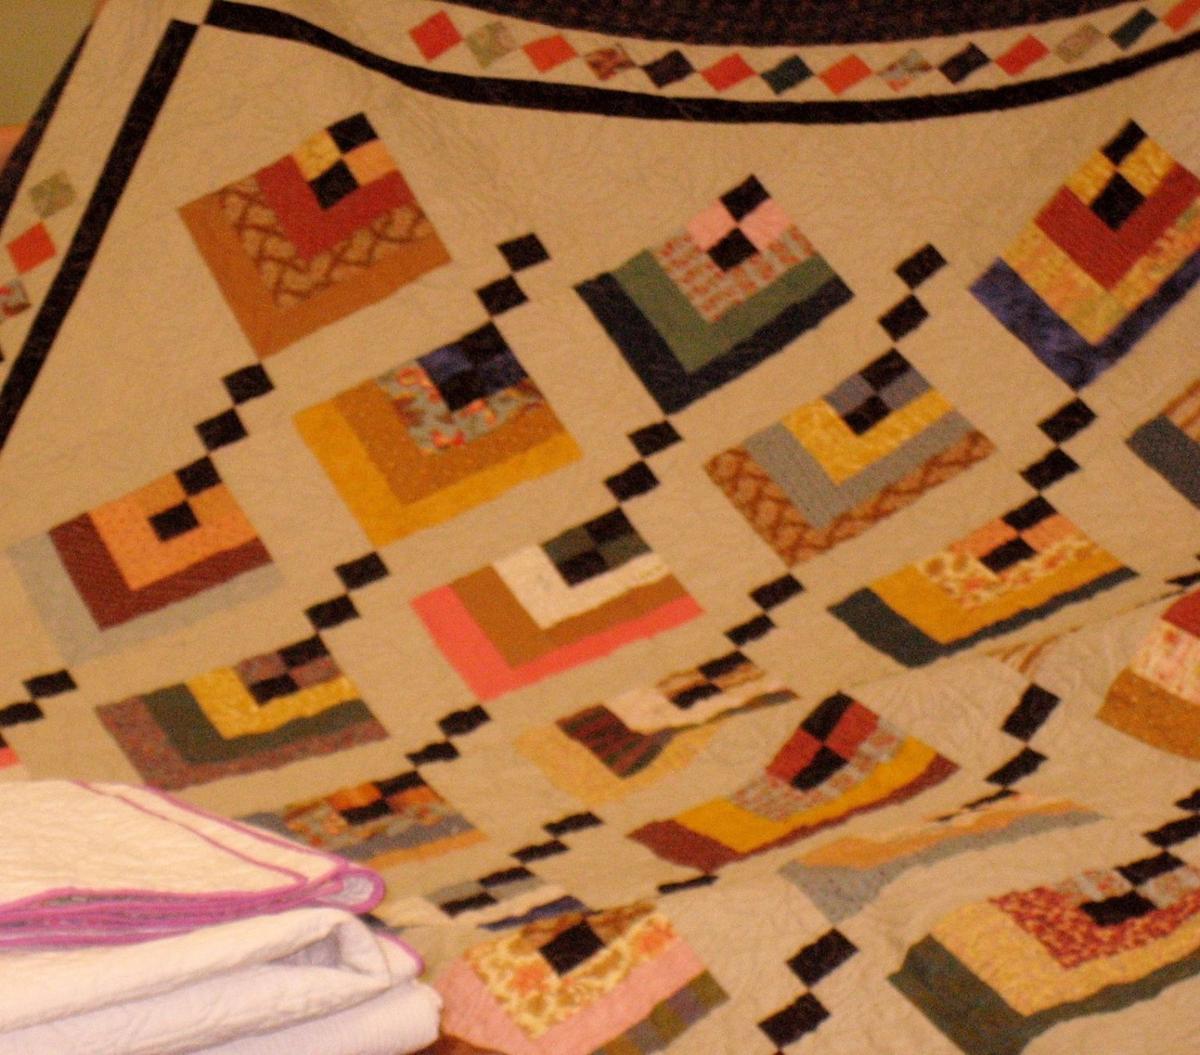 Valley quilt club plans 'Pot Luck' show   Community   observer ... : quilt club - Adamdwight.com